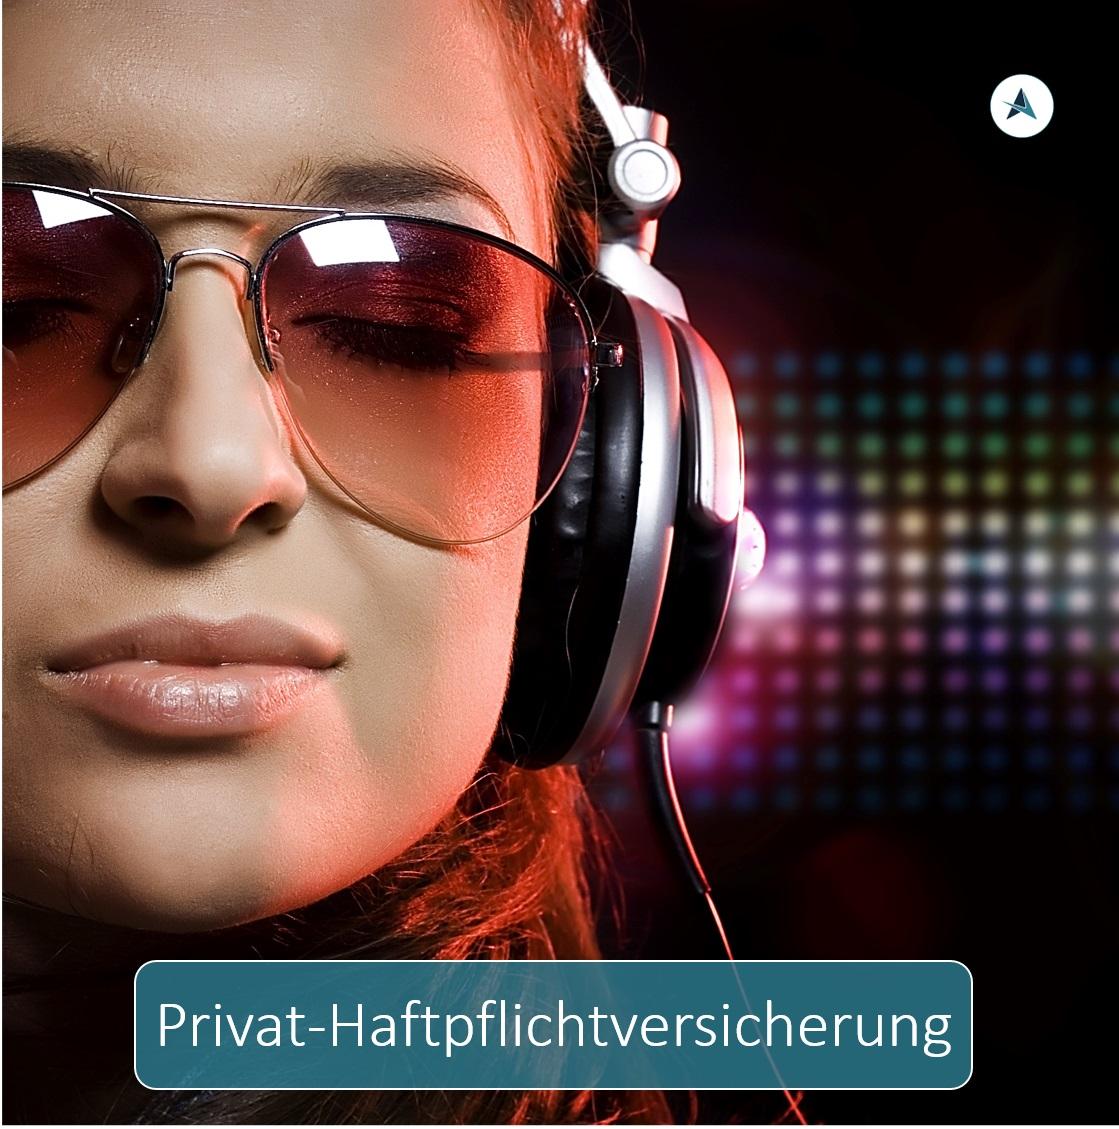 Versicherungsmakler-Berlin-Kaulsdorf-Haftpflichtversicherung-private-Haftpflichtversicherung-Privathaftpflichtversicherung-André-Böttcher-Haftpflicht